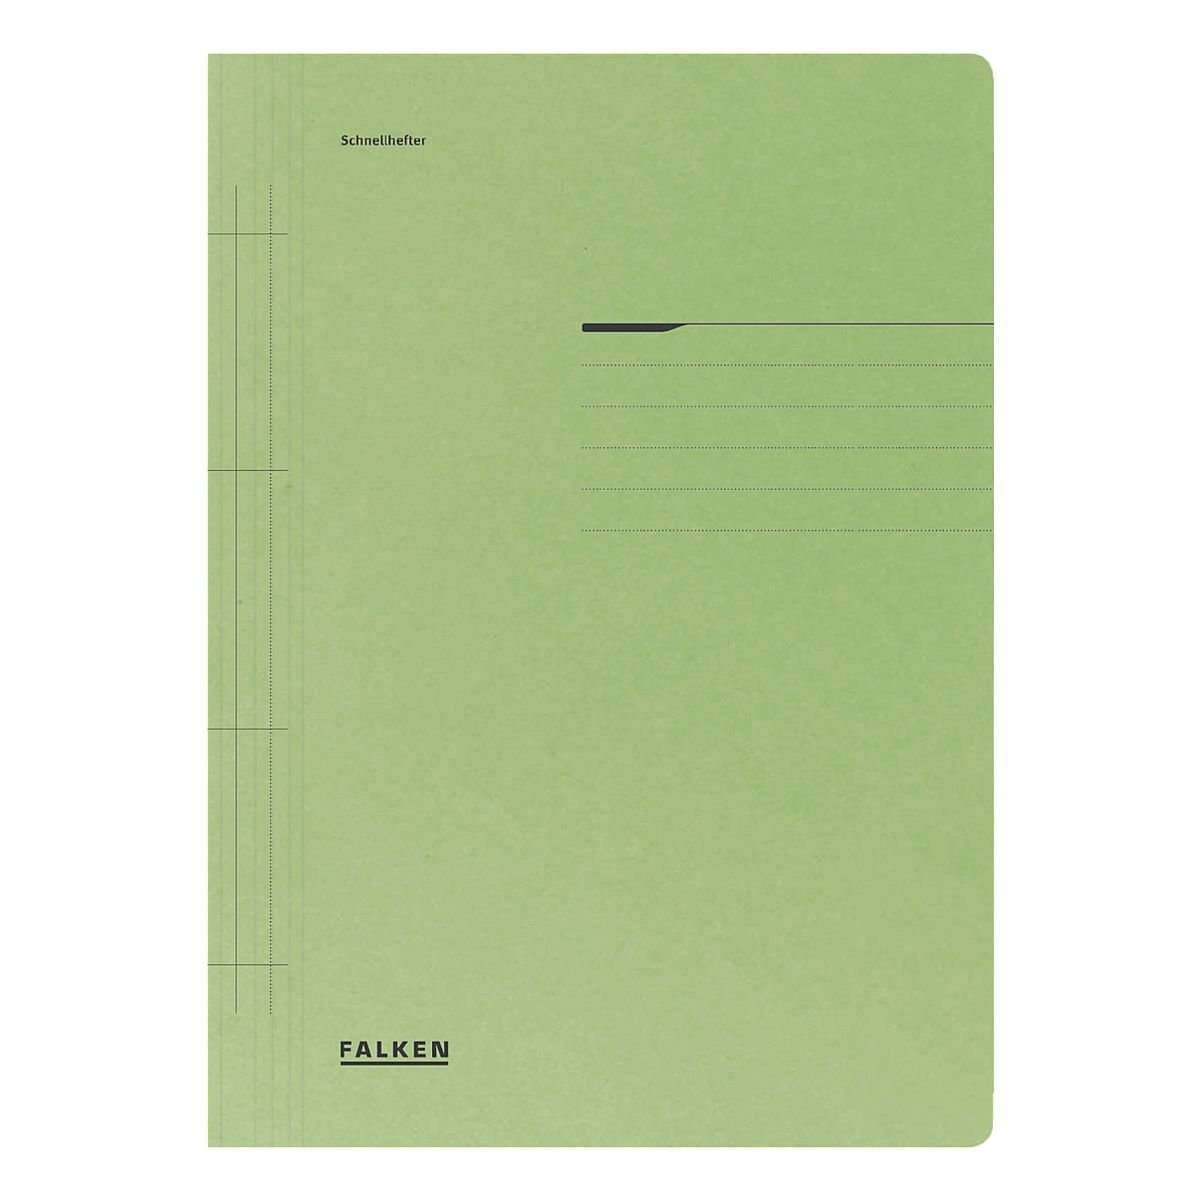 Schnellhefter A4, Fassungsvermögen 250 Blatt